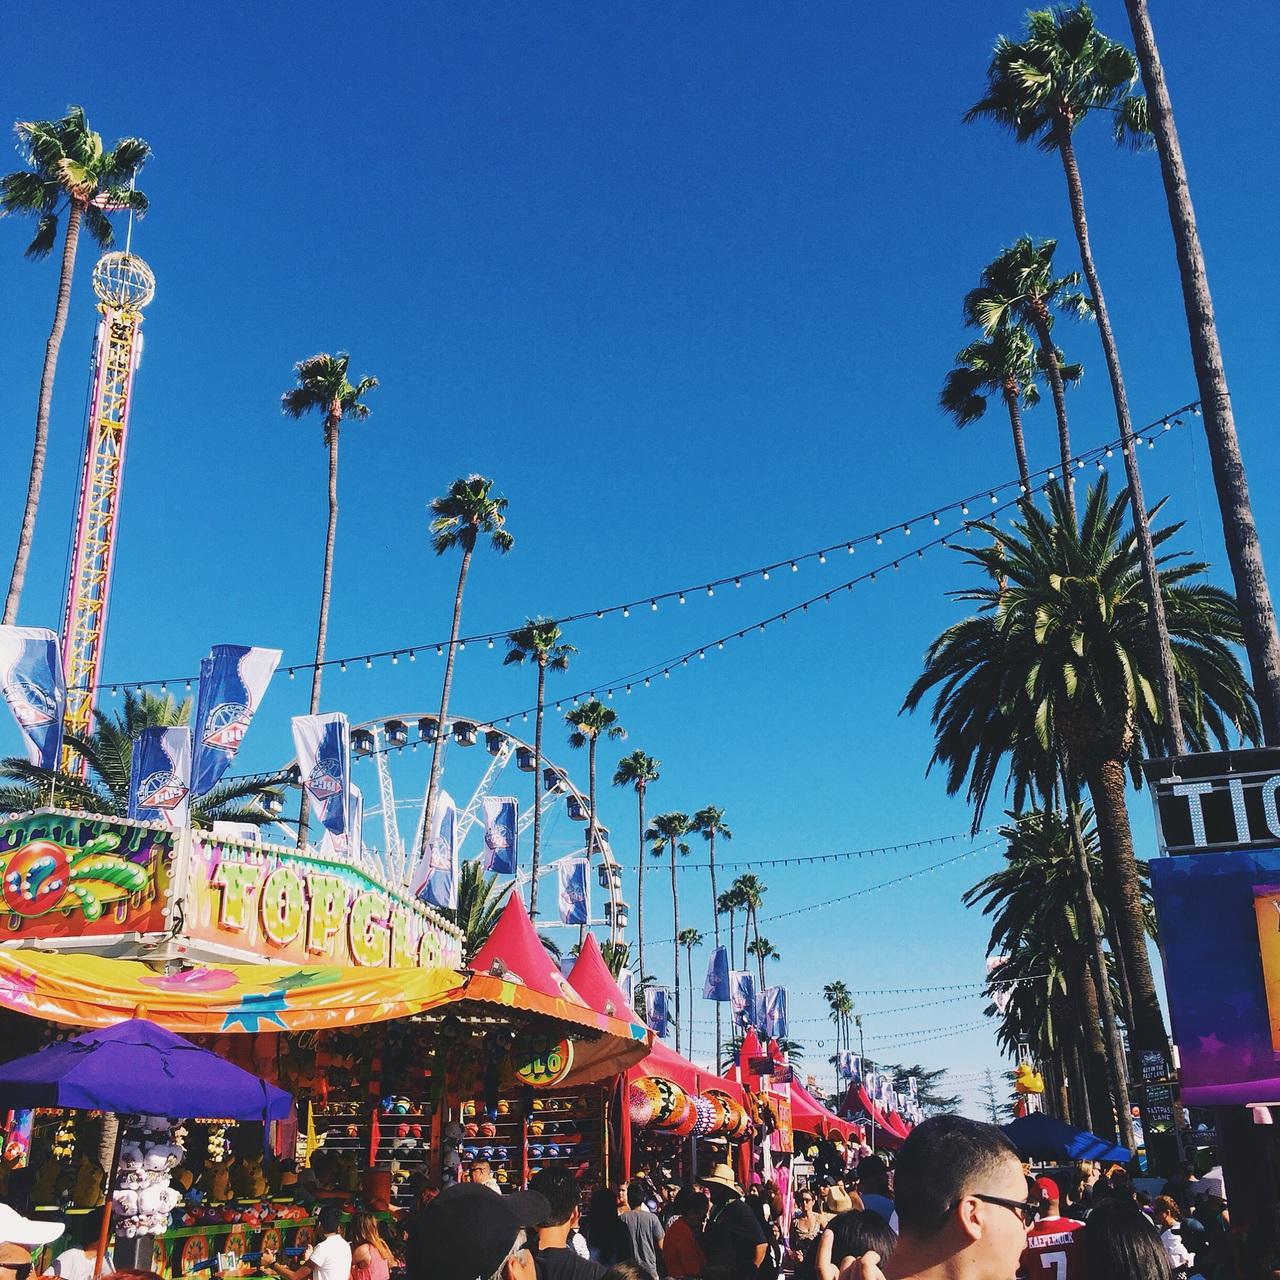 cali, california, and carnival image